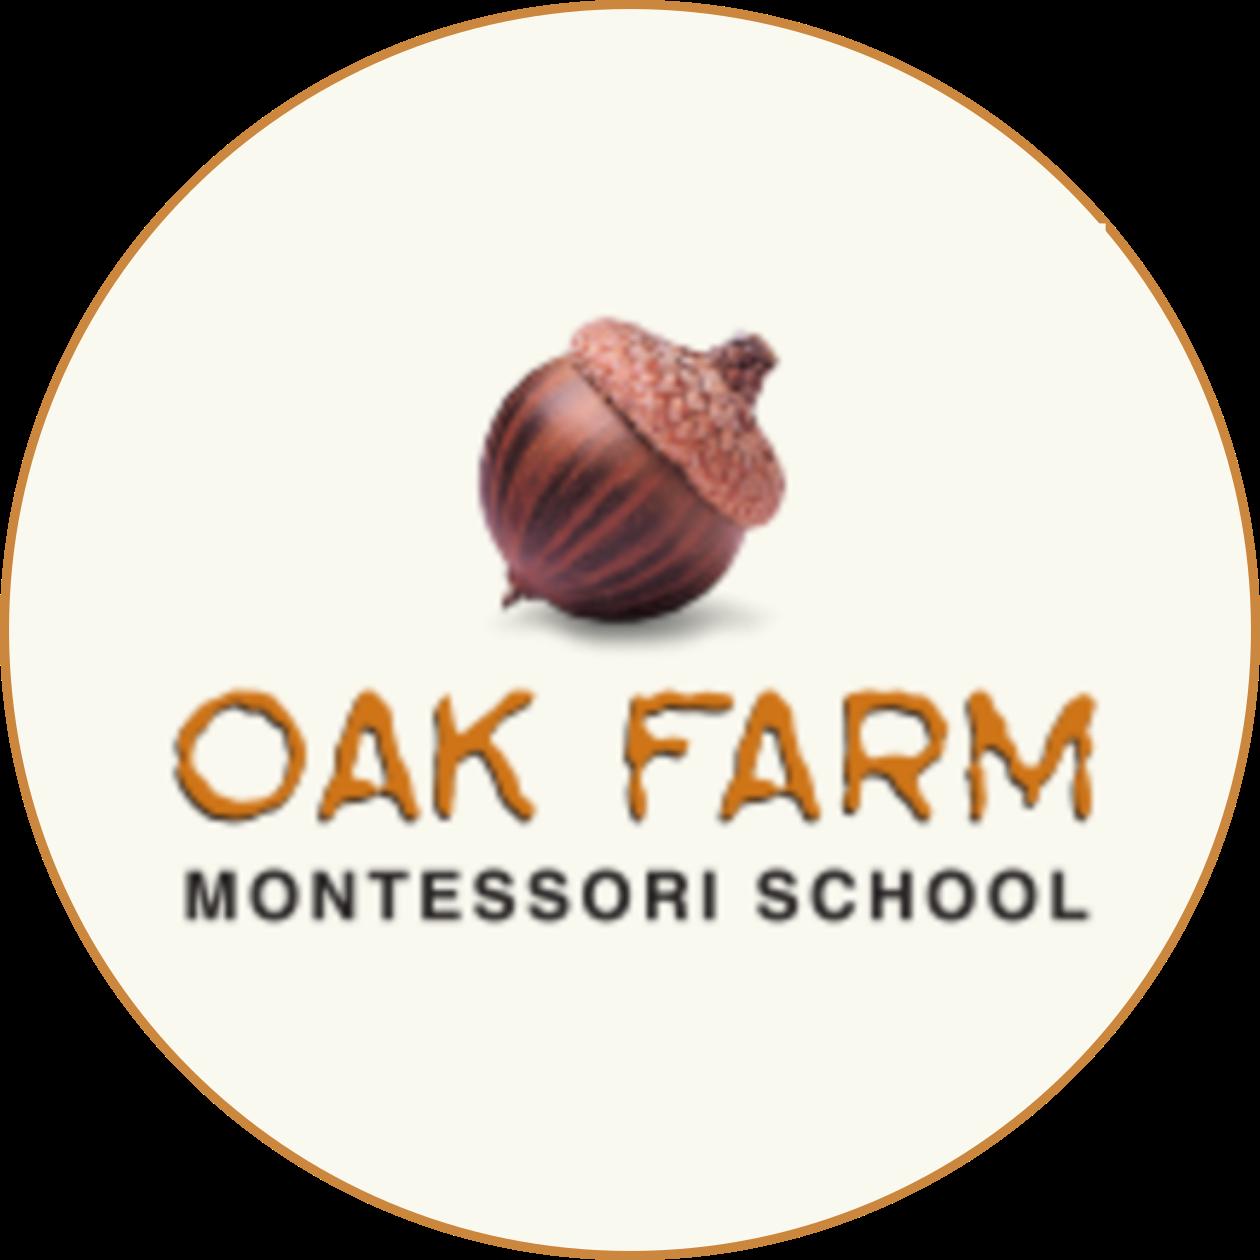 Oak Farm Montessori School - Avilla, IndianaFull Member